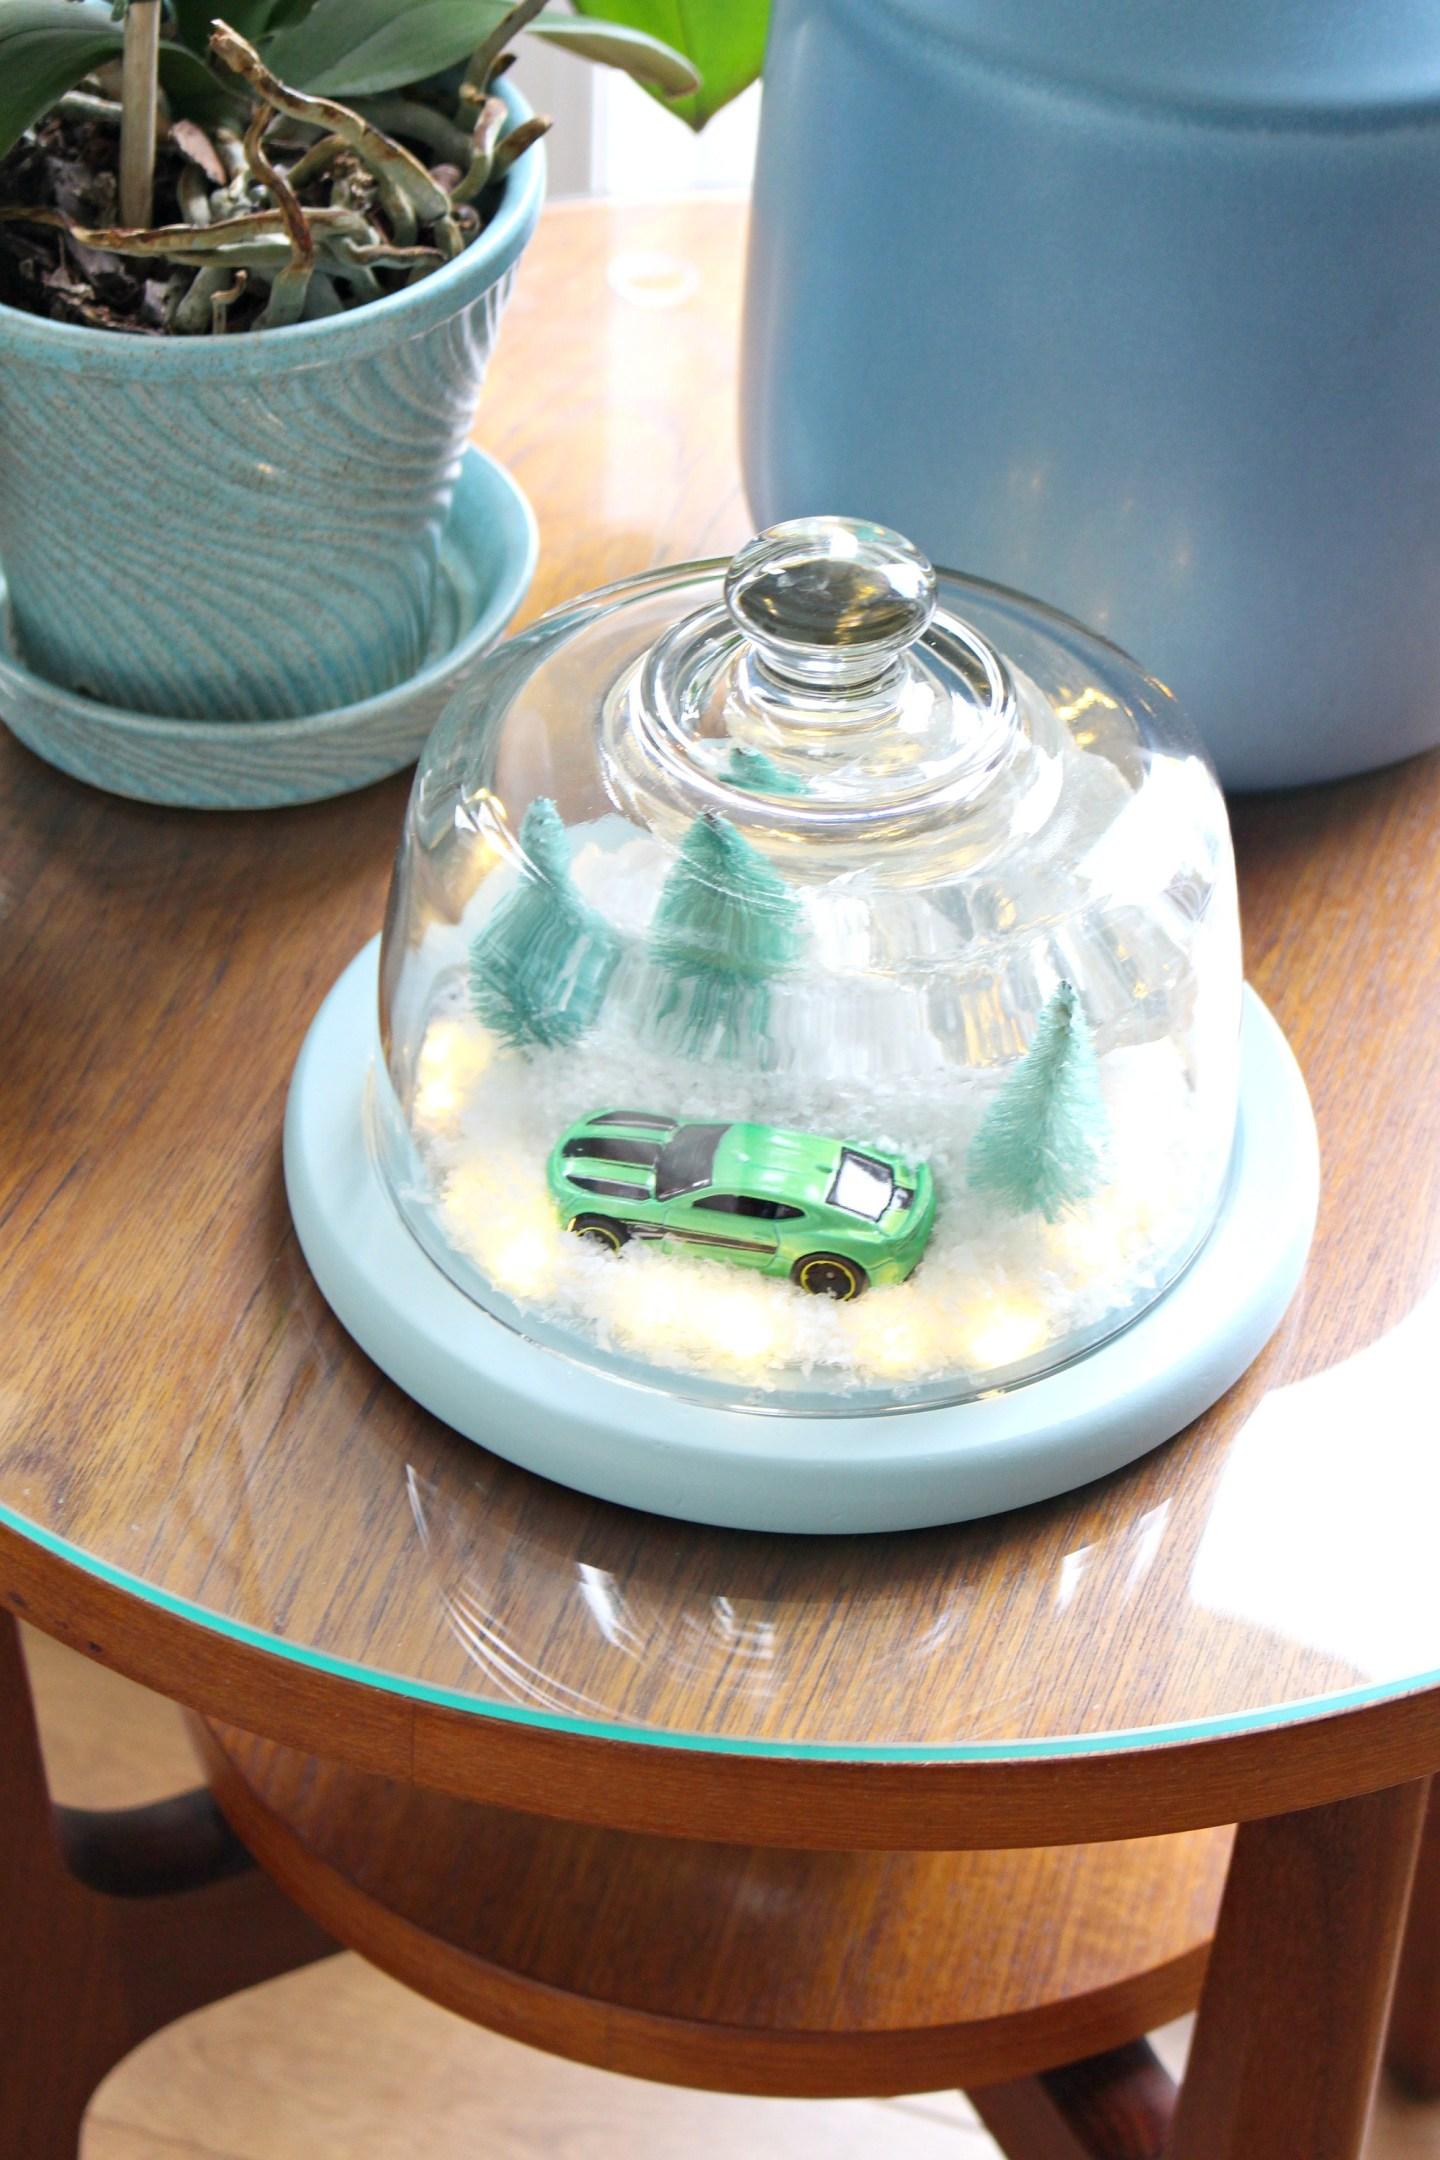 DIY Winter Diorama | aka The Camaro Cloche. Make this easy winter decor using a thrifted cheese cloche. #diy #holidaydecor